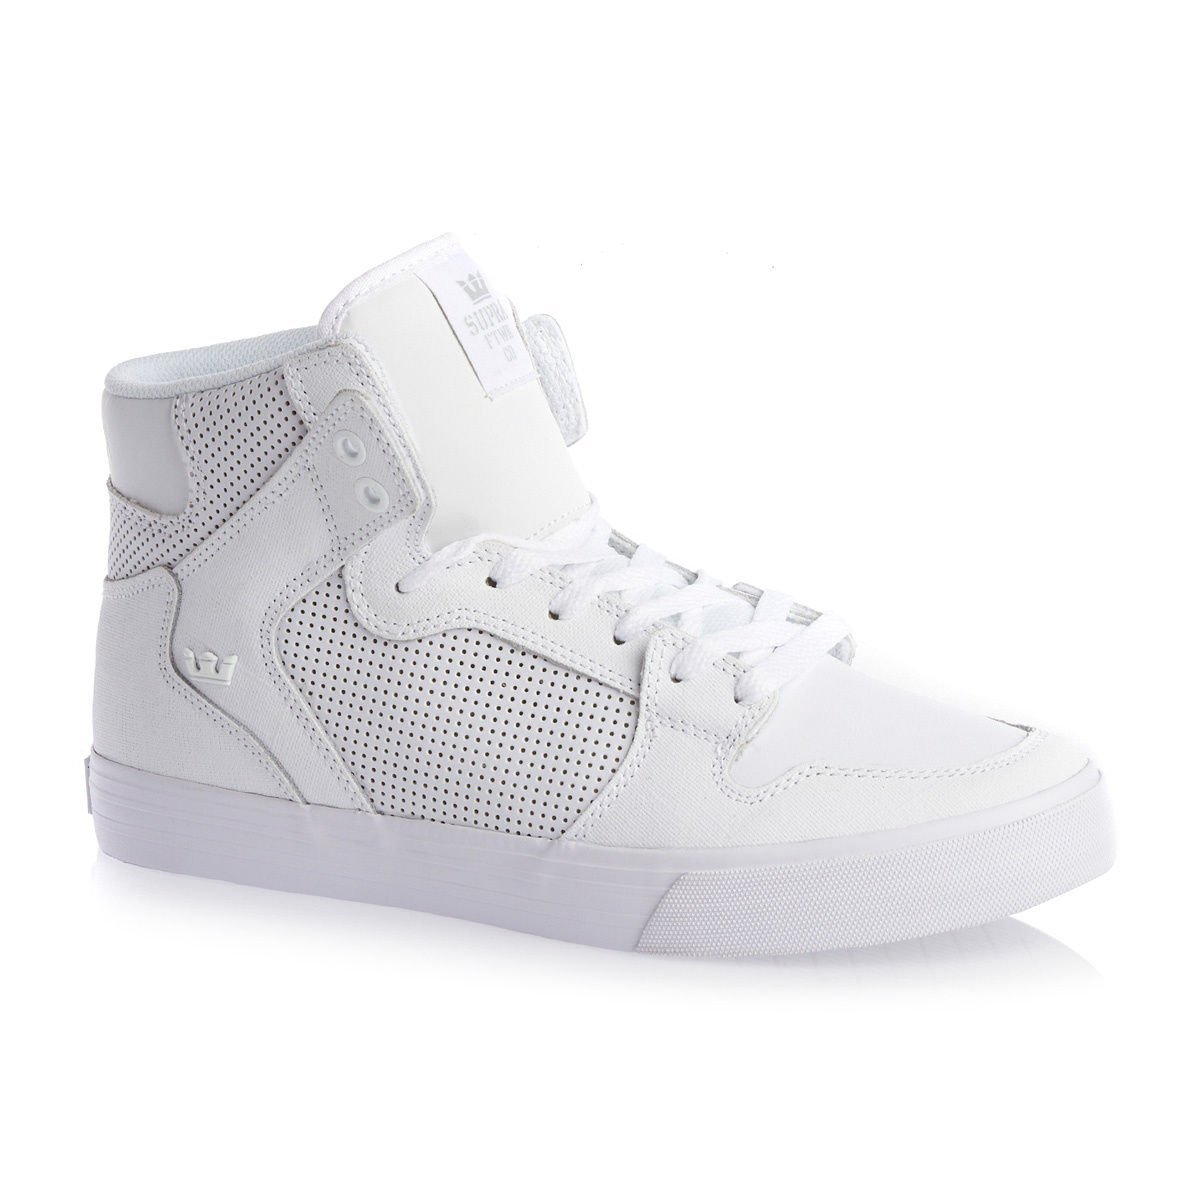 SUPRA(スープラ) VAIDER B00LGRV06Y 9.5 D(M) US White Gunny TUF/White Microperf Leather